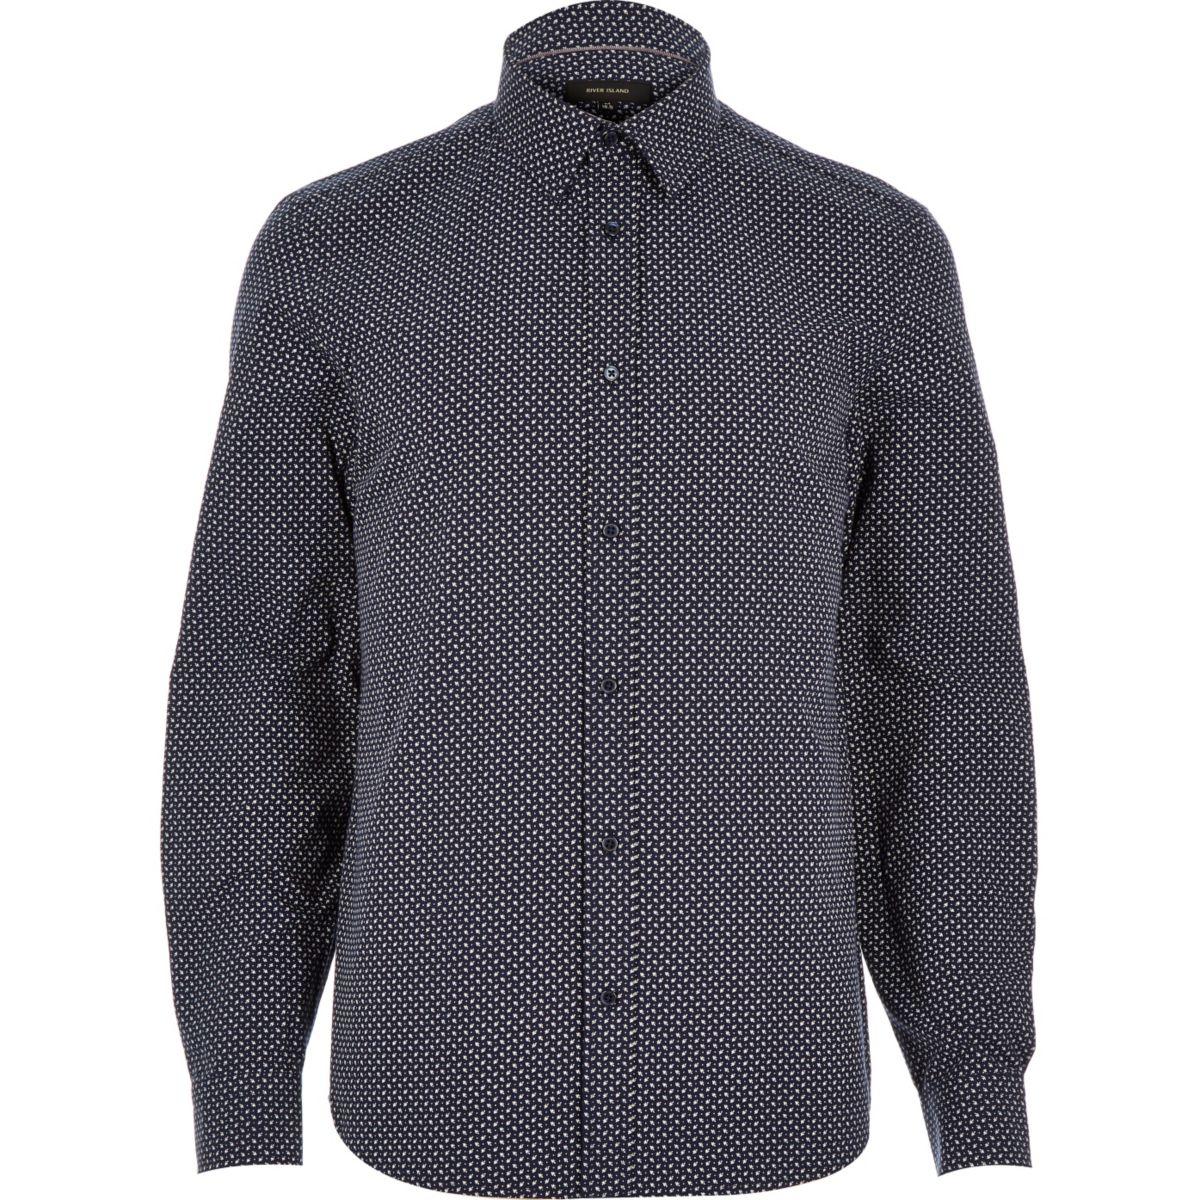 Navy blue arrow print shirt